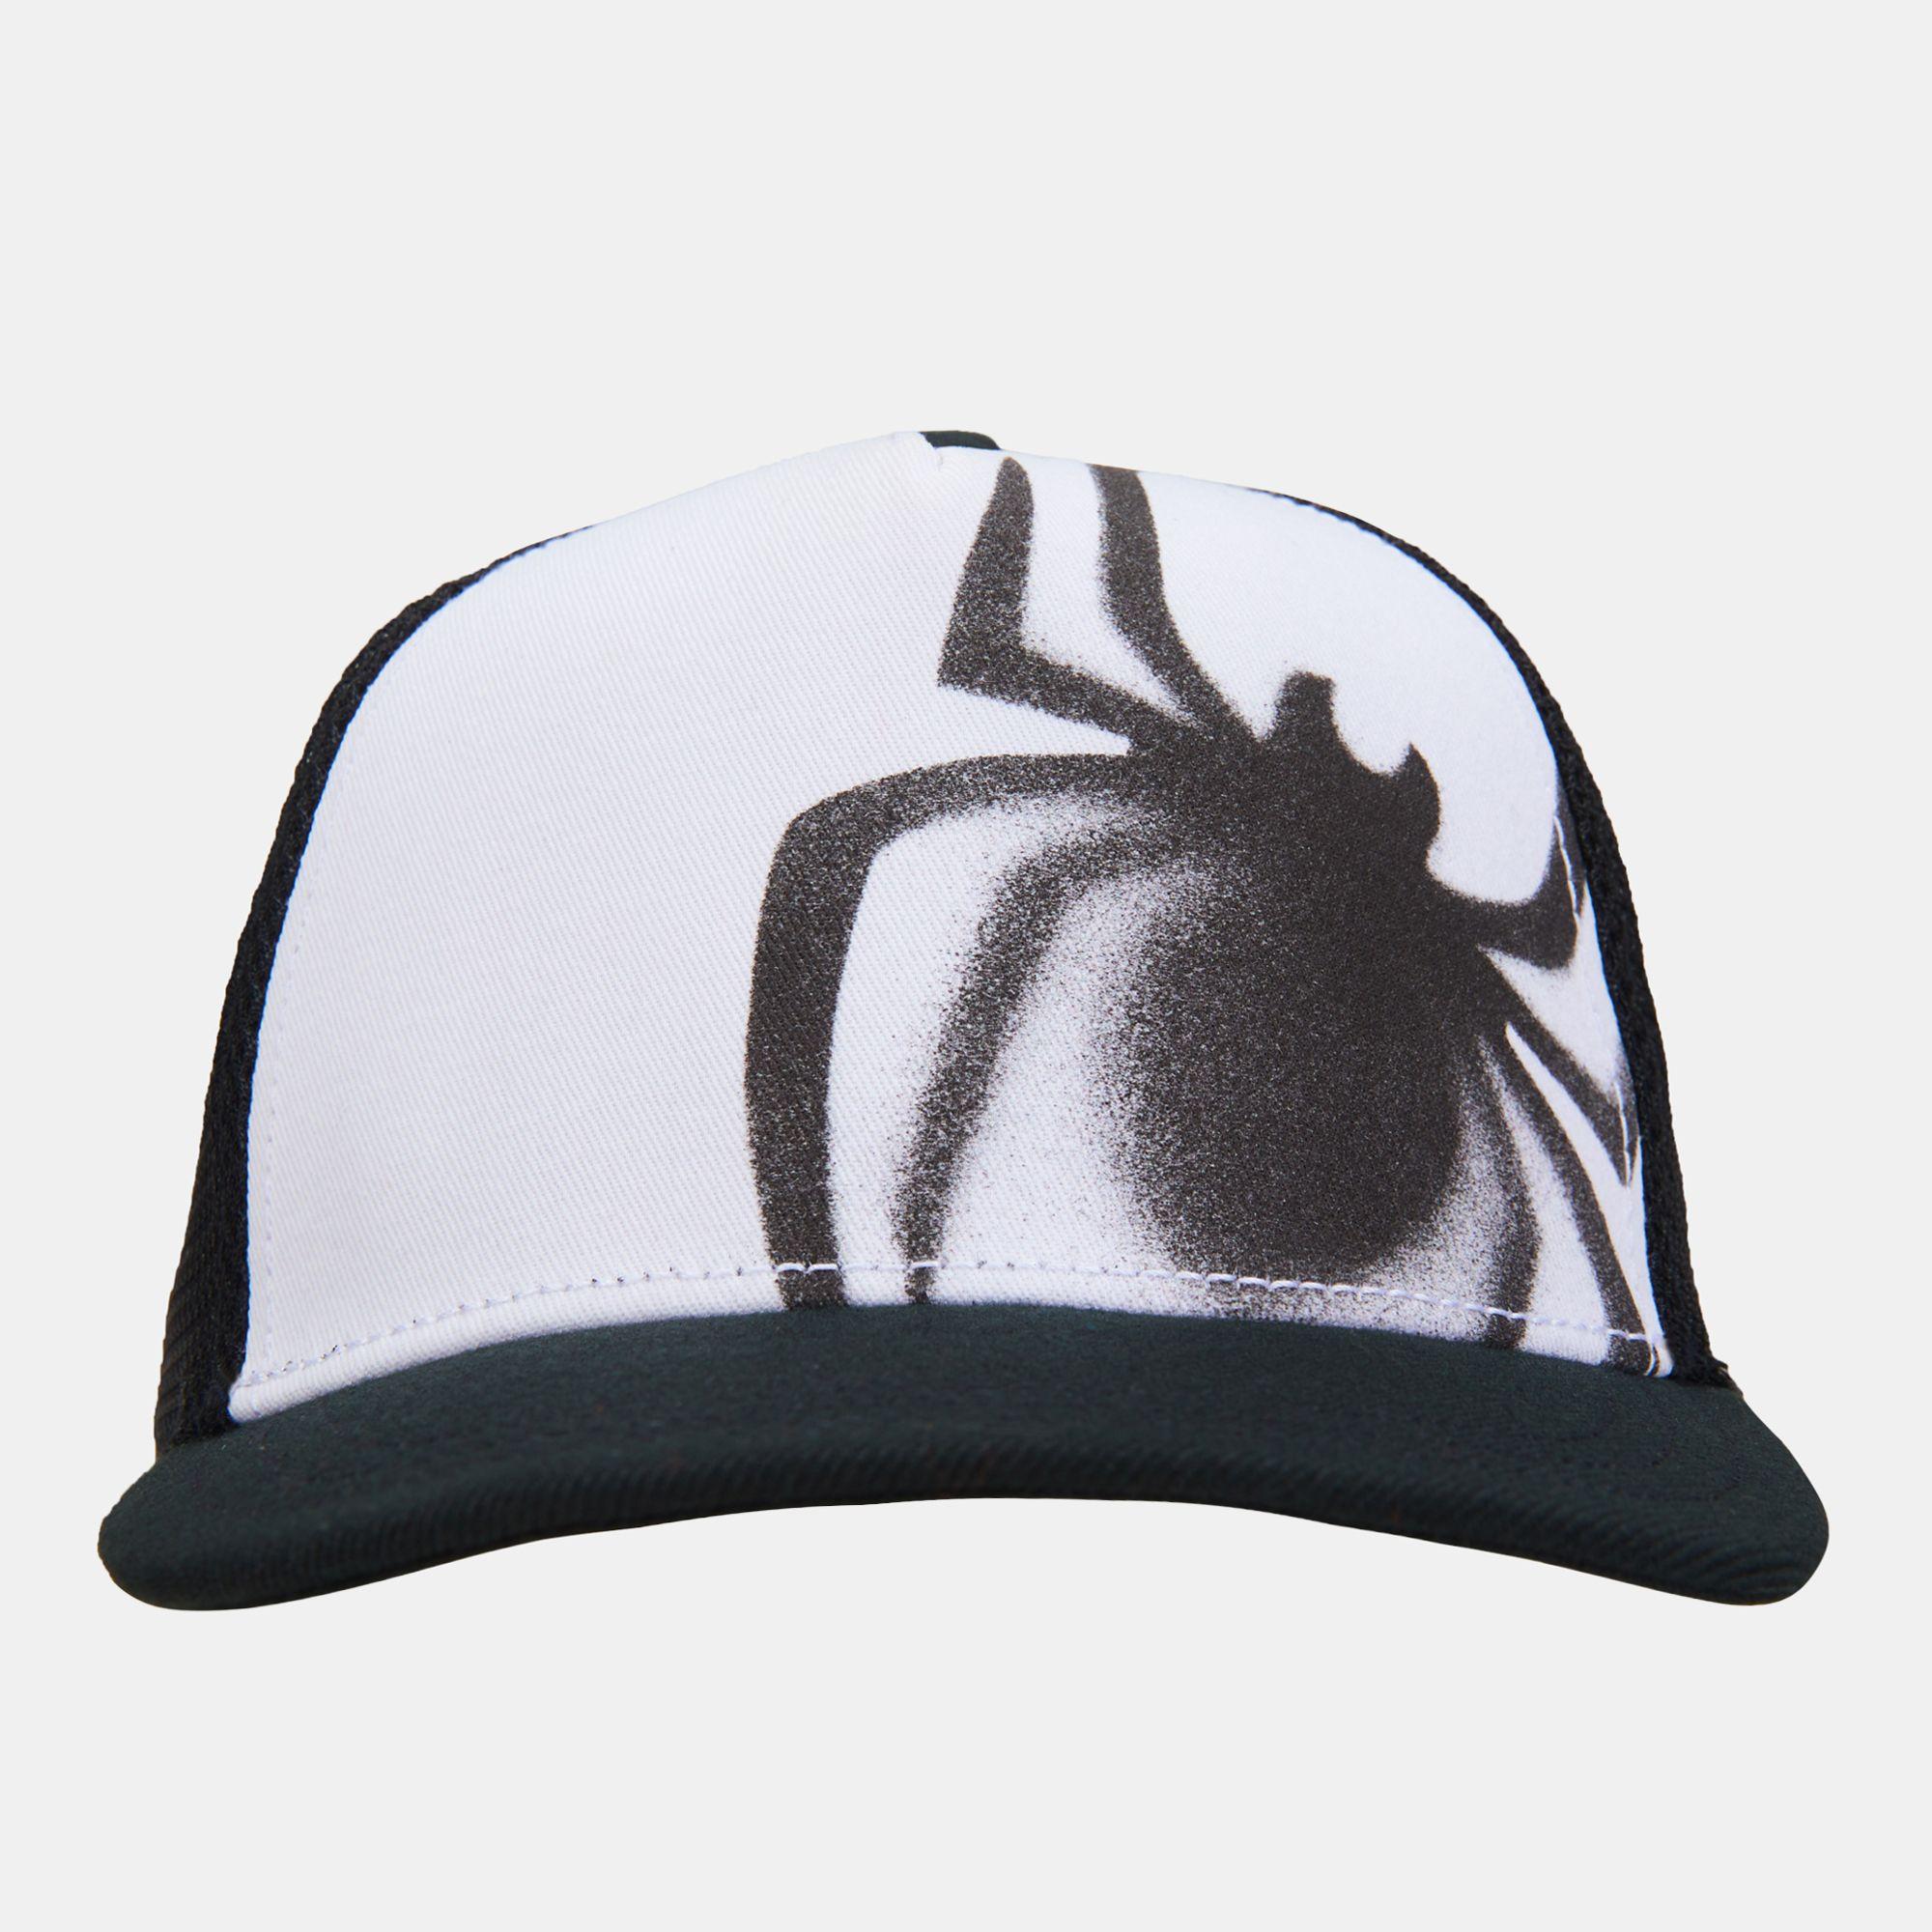 Marvel Spider-Man Boys Baseball Cap Childrens Hat